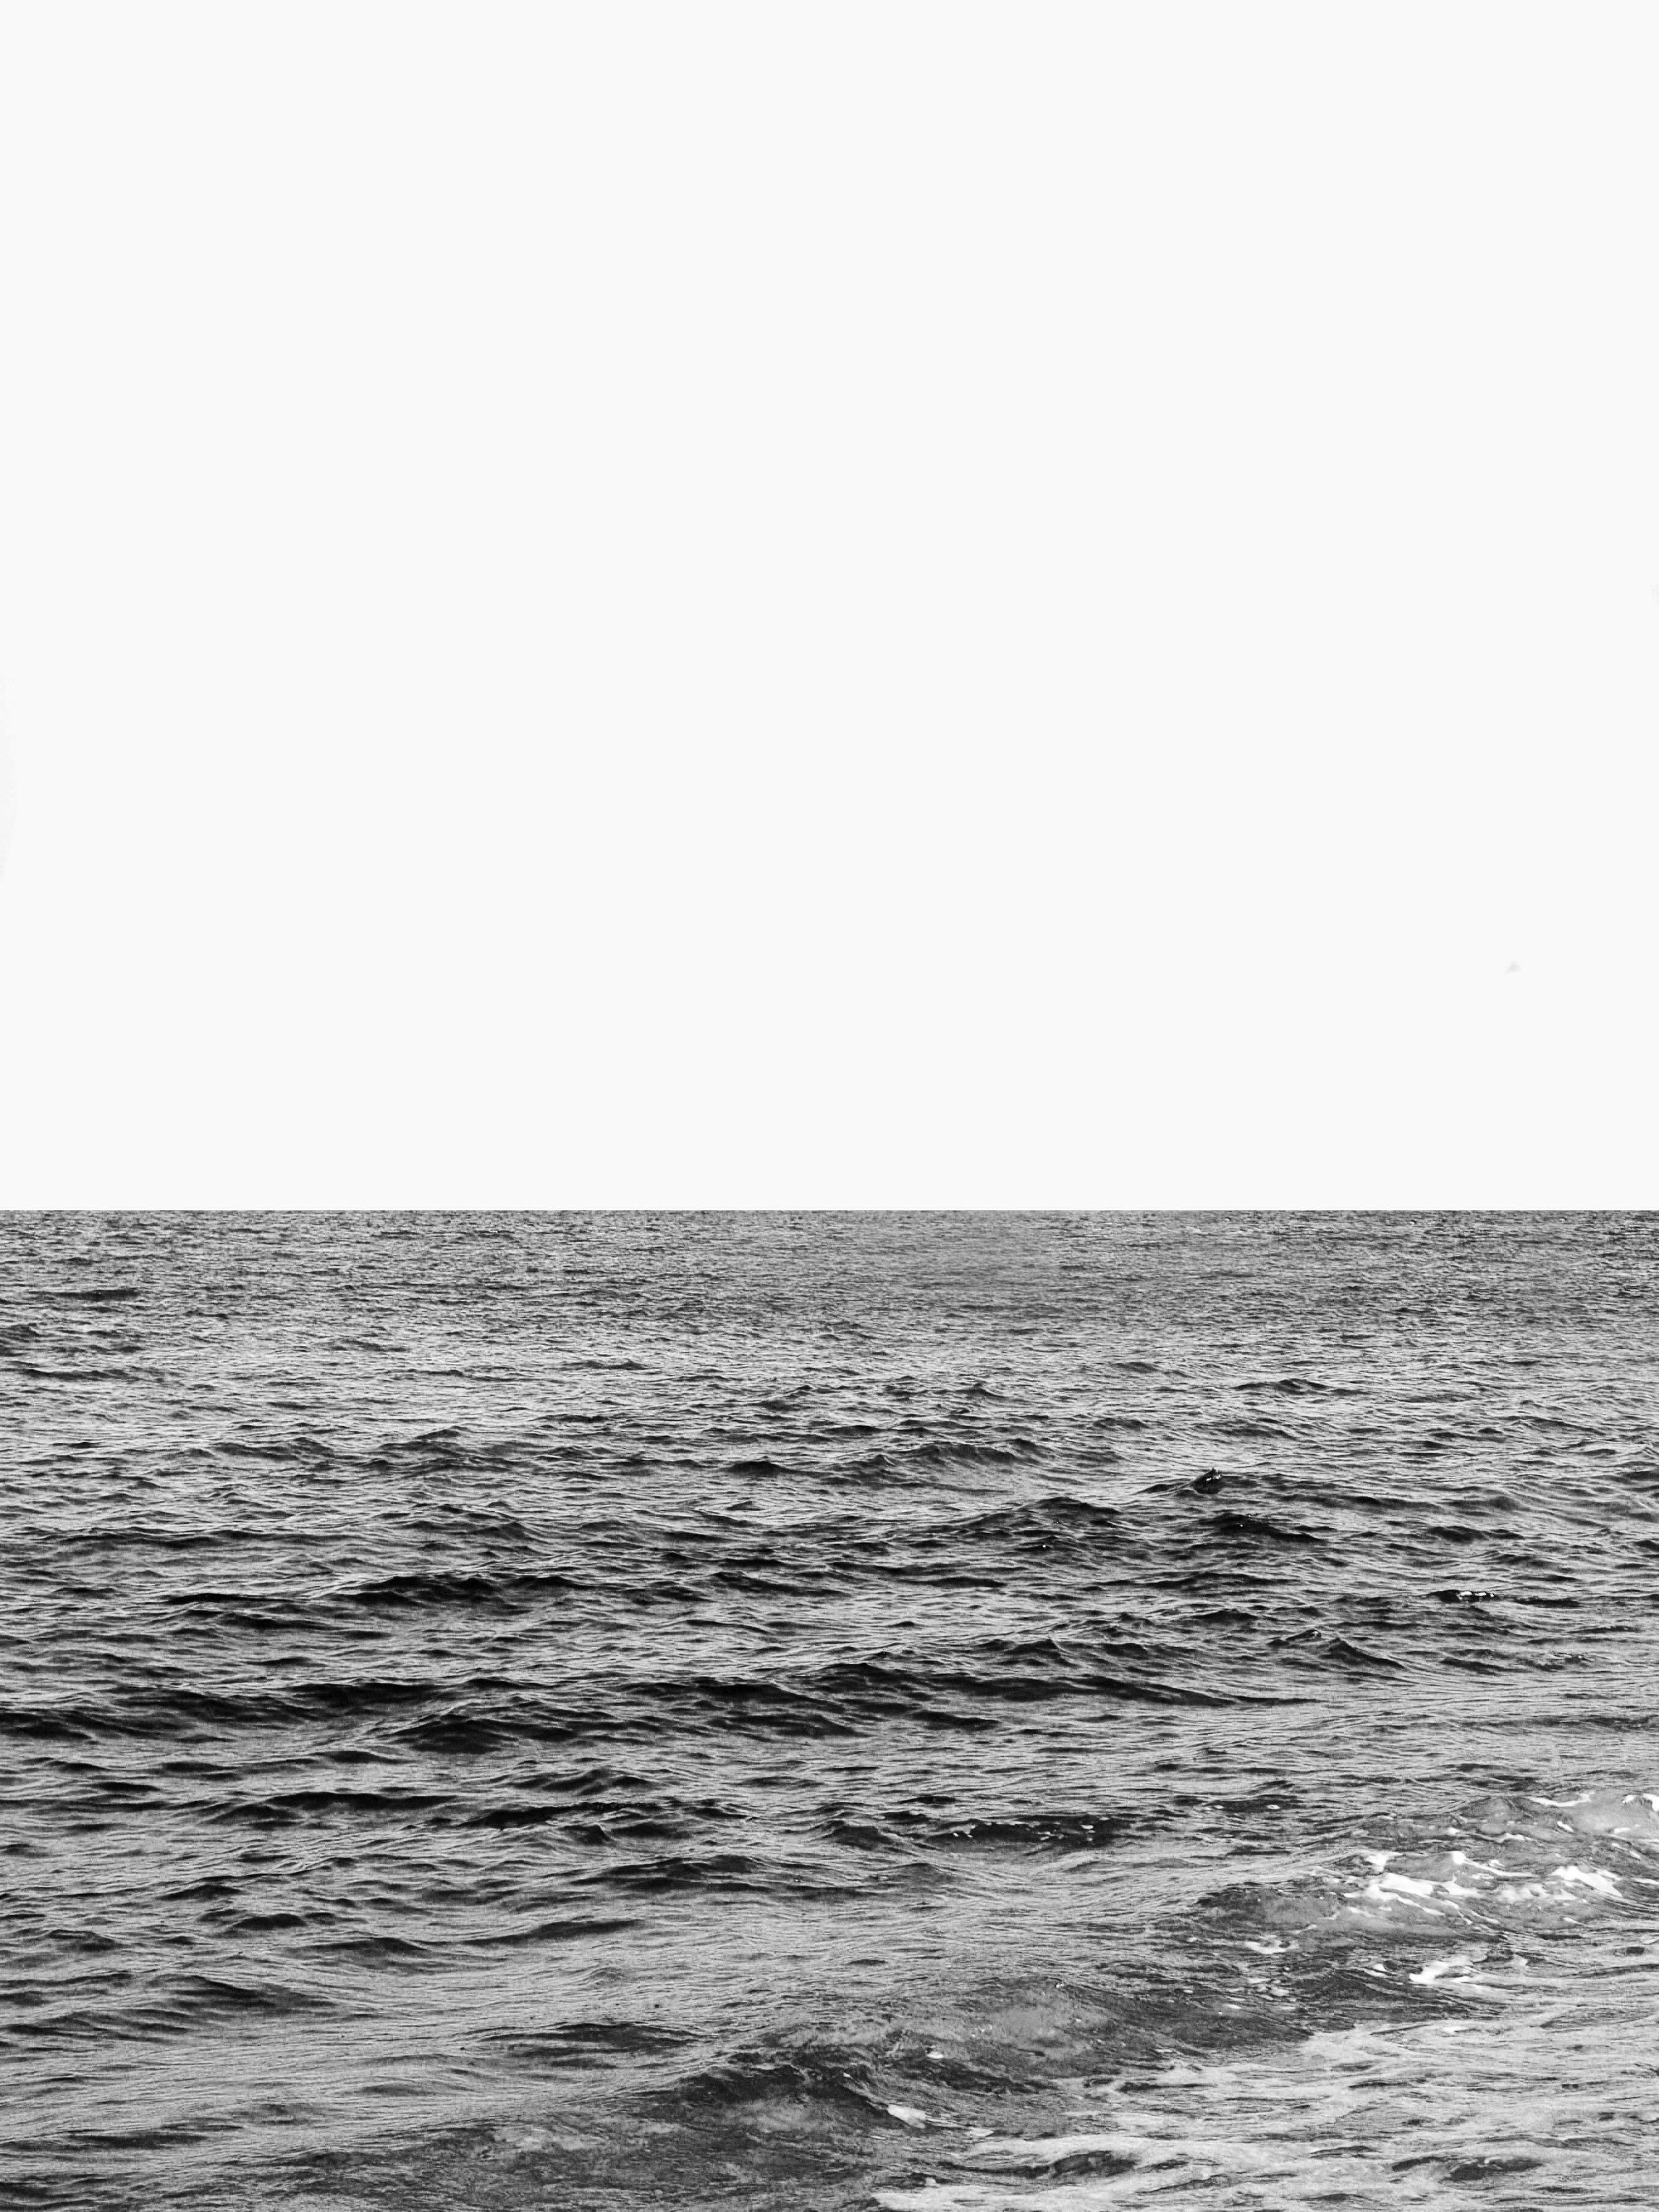 ocean_photography.JPG